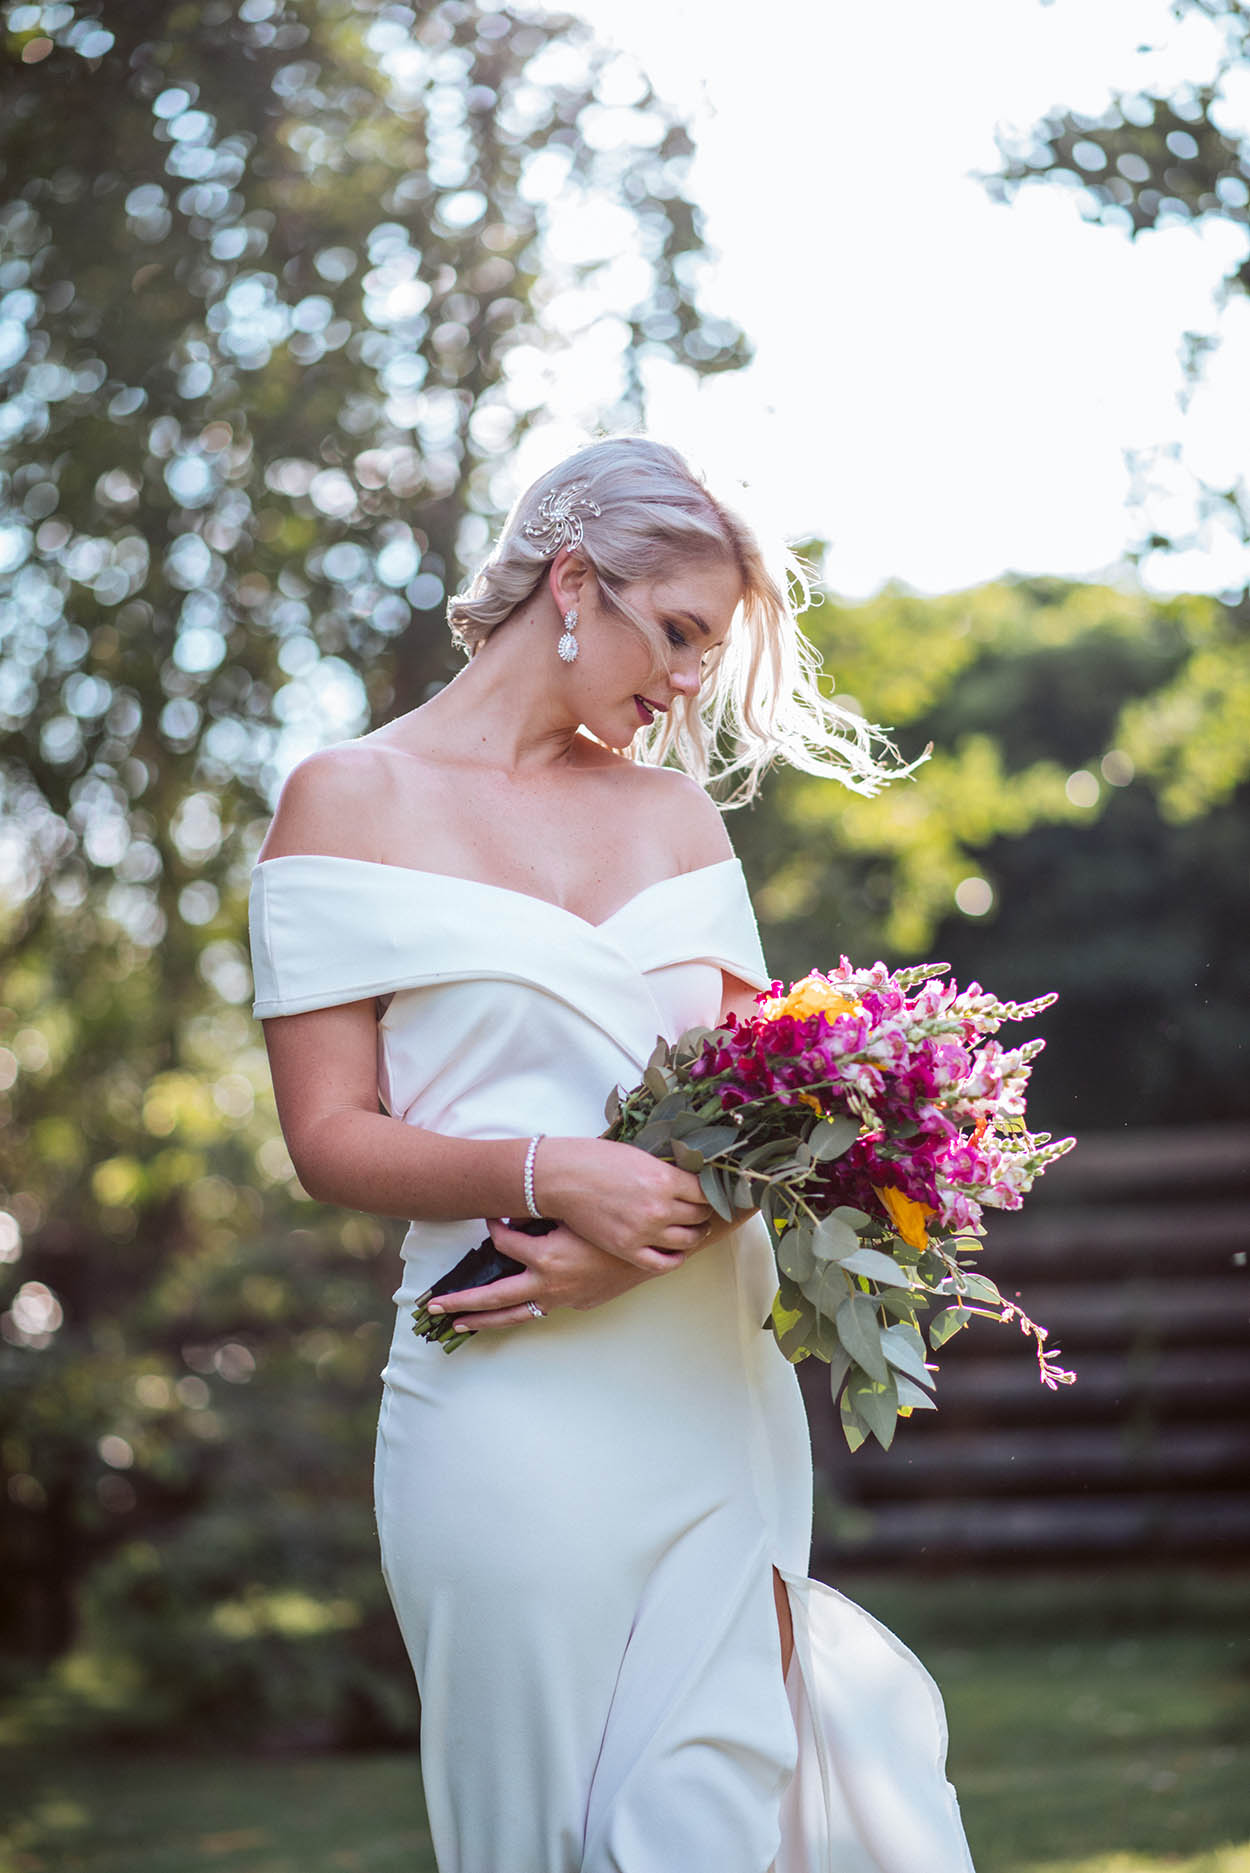 bride holding flowers by Bloemfontein wedding Photographer Mudboots Photography